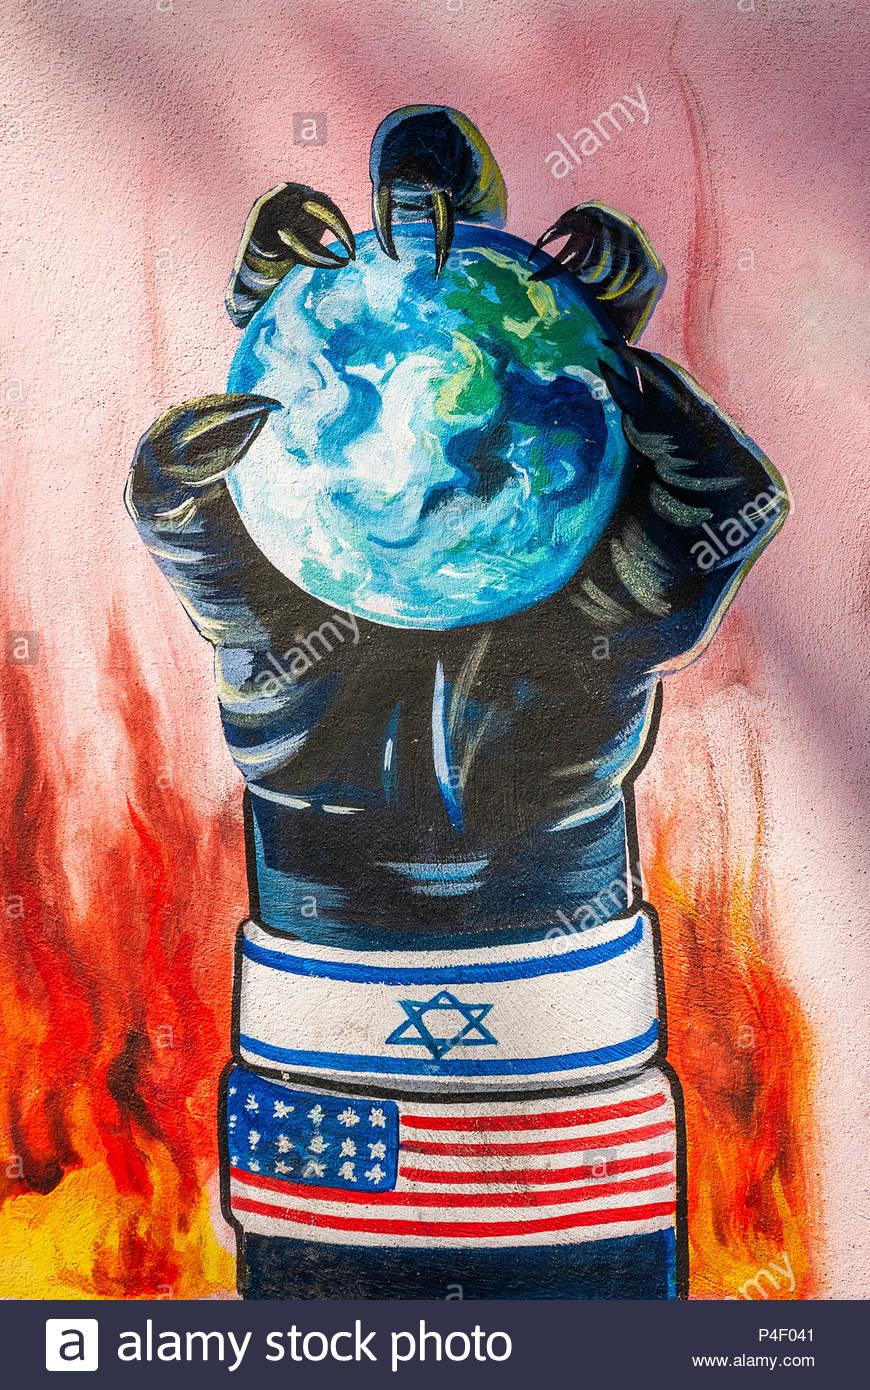 anti american and israel propaganda mural on tehran street iran outside former US embassy - Stock Image